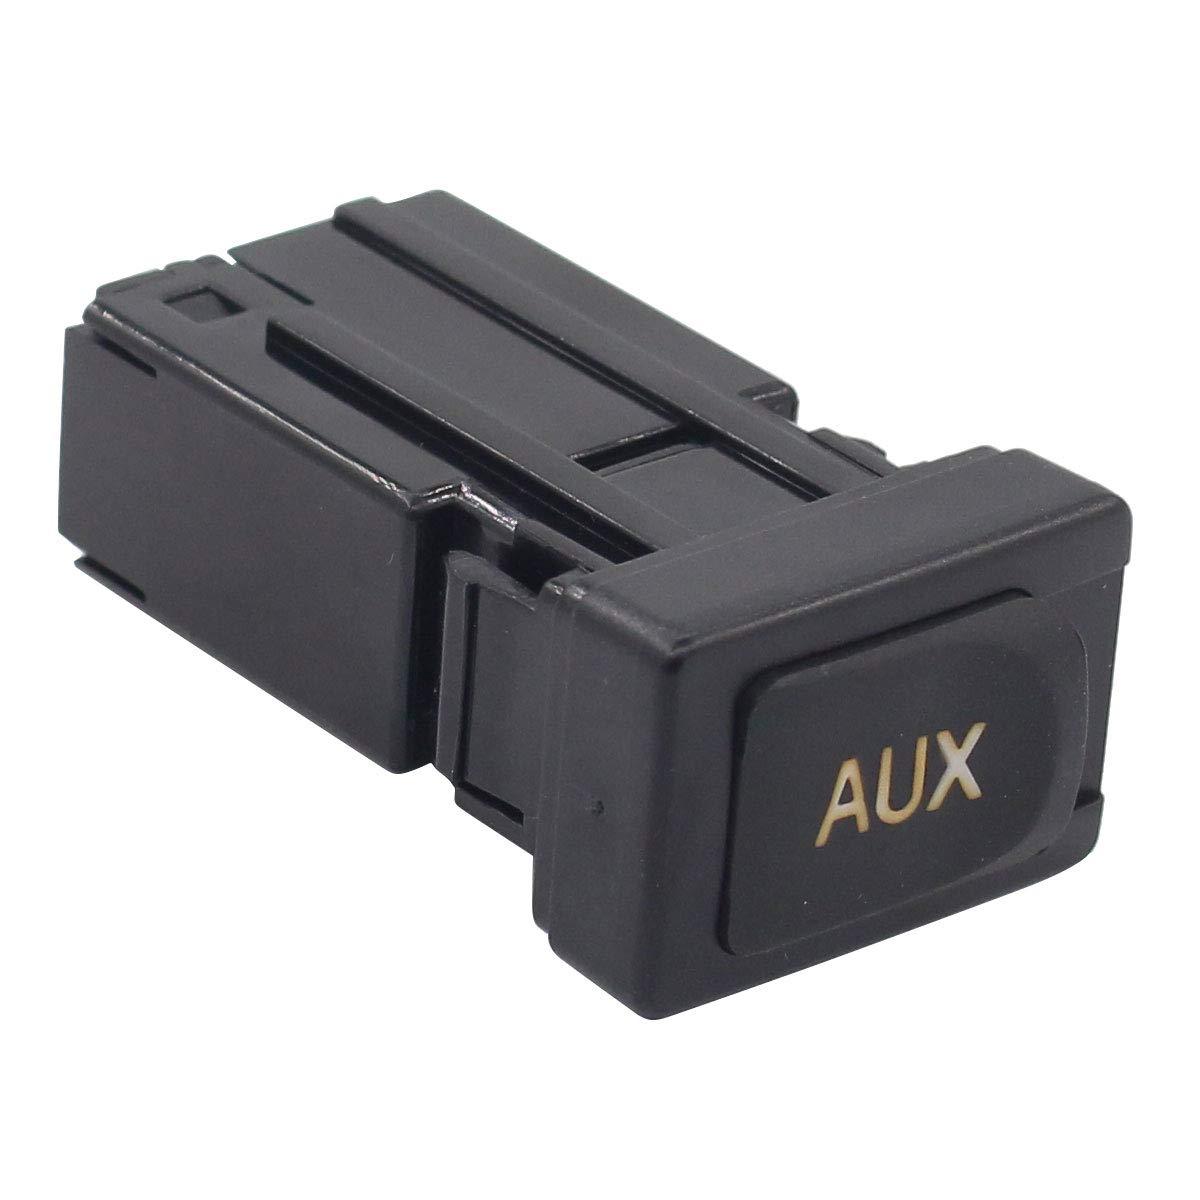 Для RAV4 автомобиля AUX аудио интерфейс стерео для Toyota Переключатель окон Corolla OE: 86190-02010